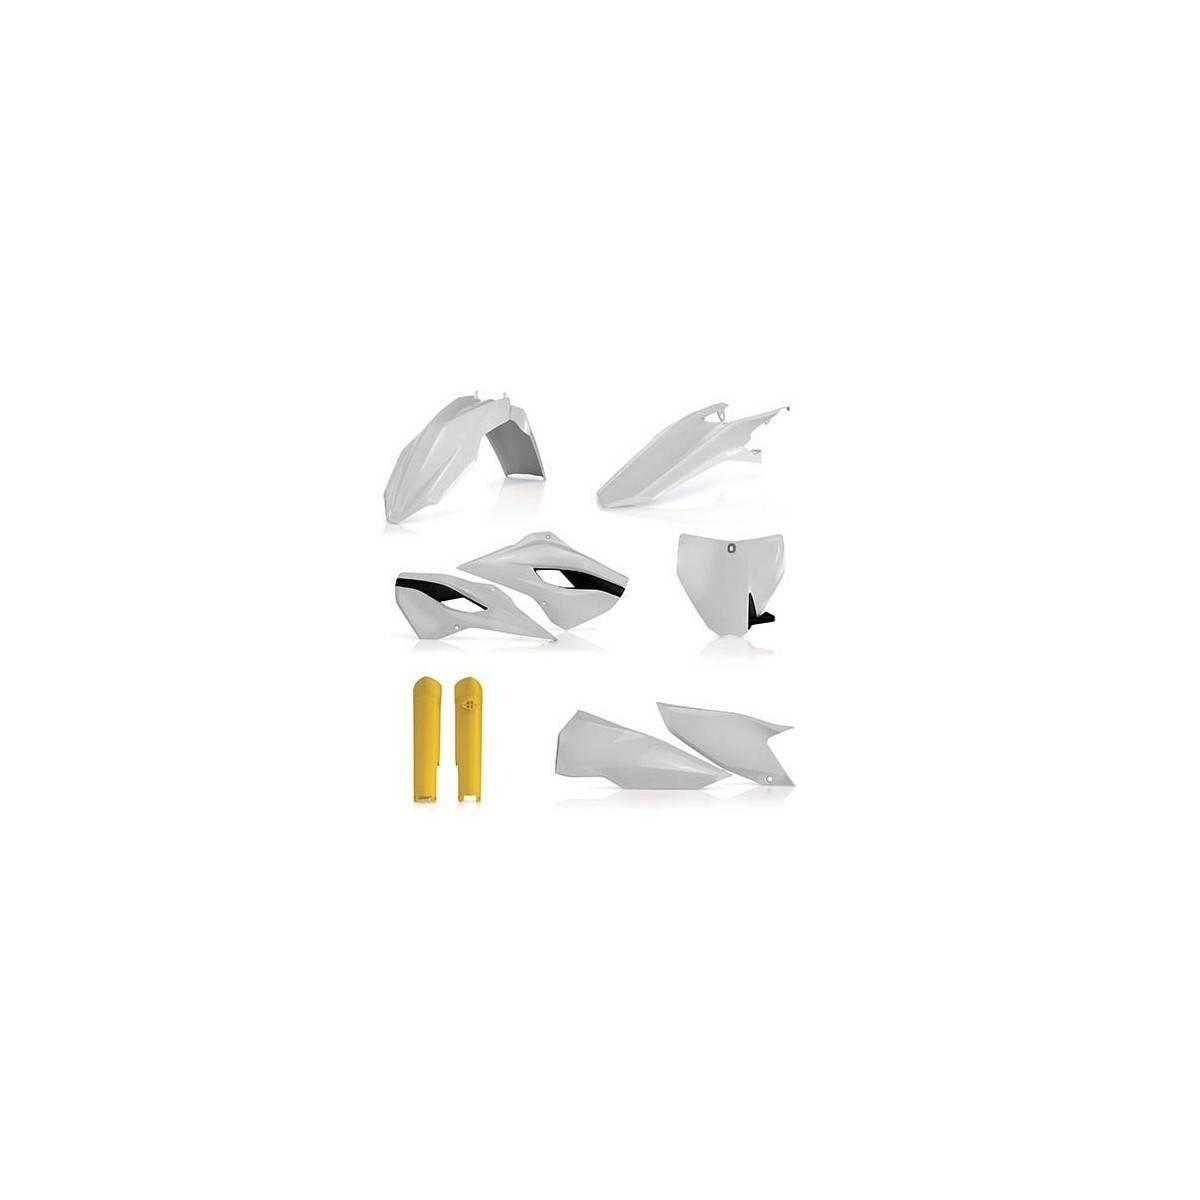 0022808-553 - Full Kit Plasticos Tc85 14 17 Origen